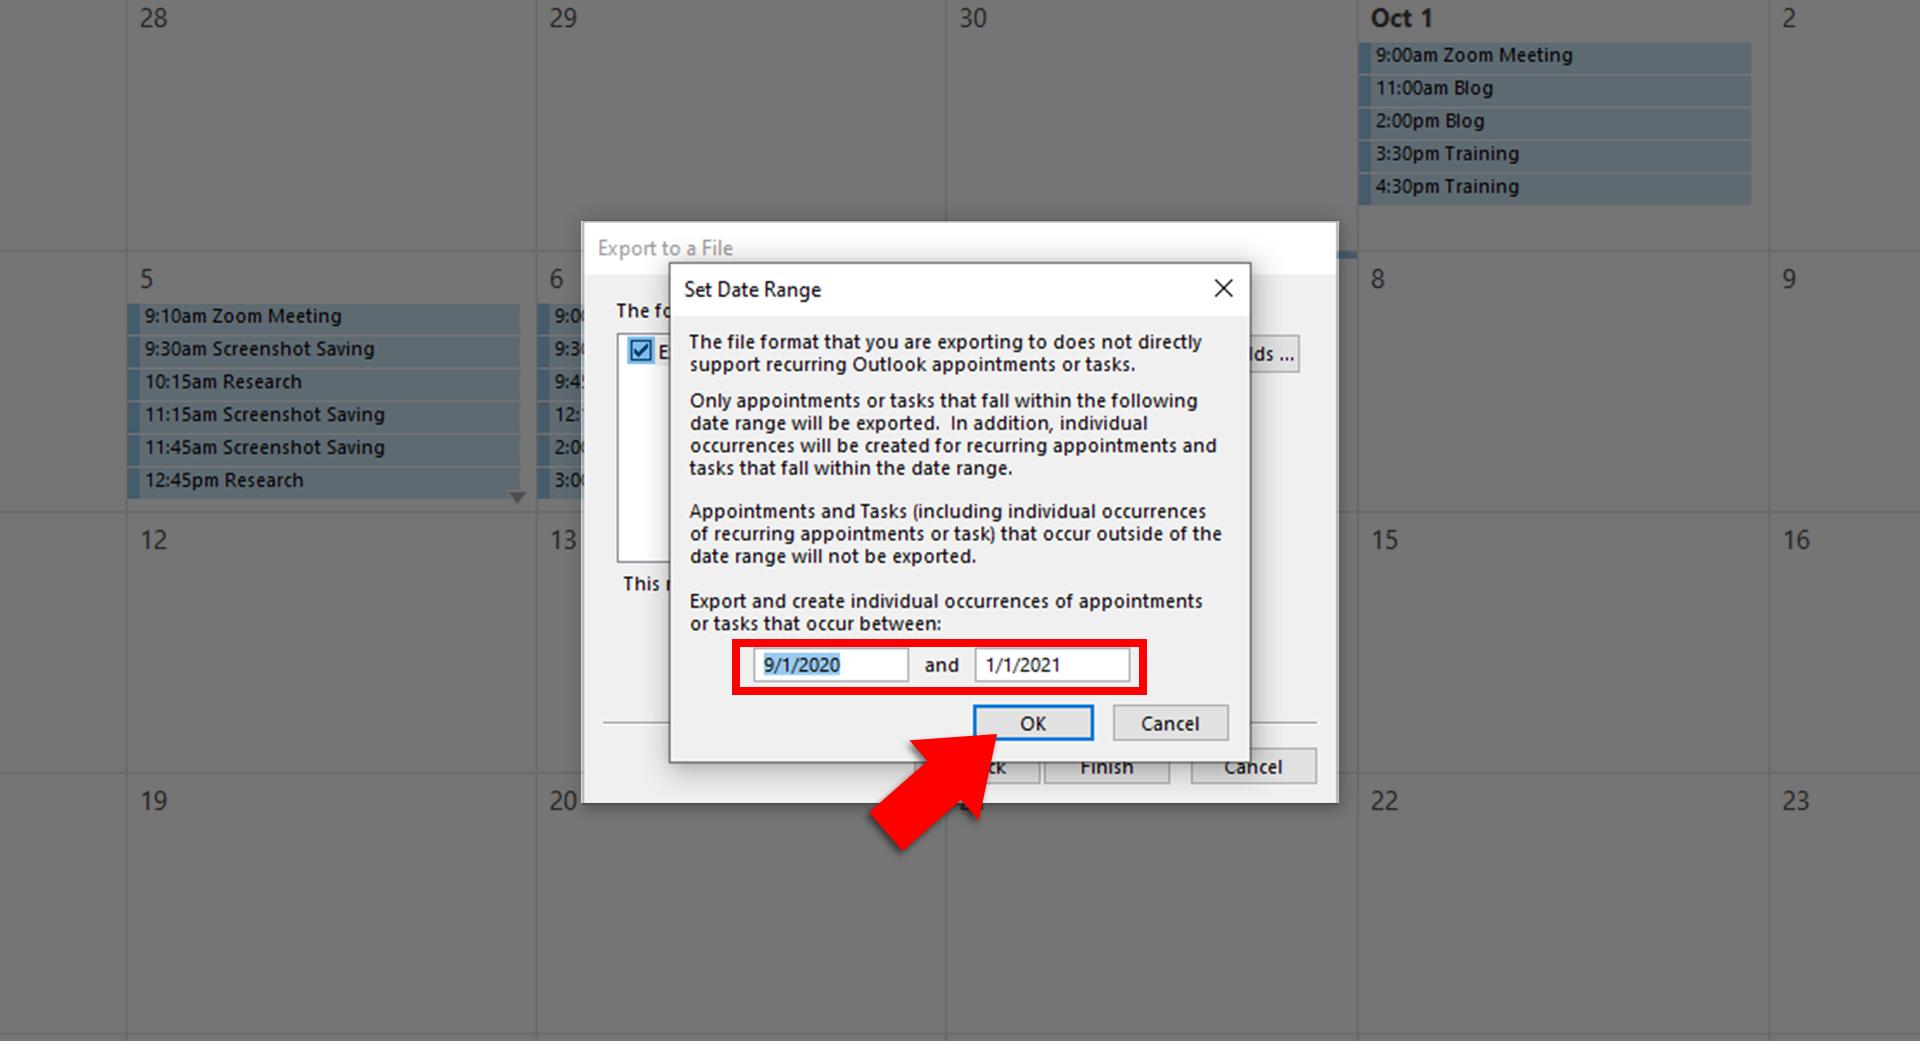 Set date range and click Ok.